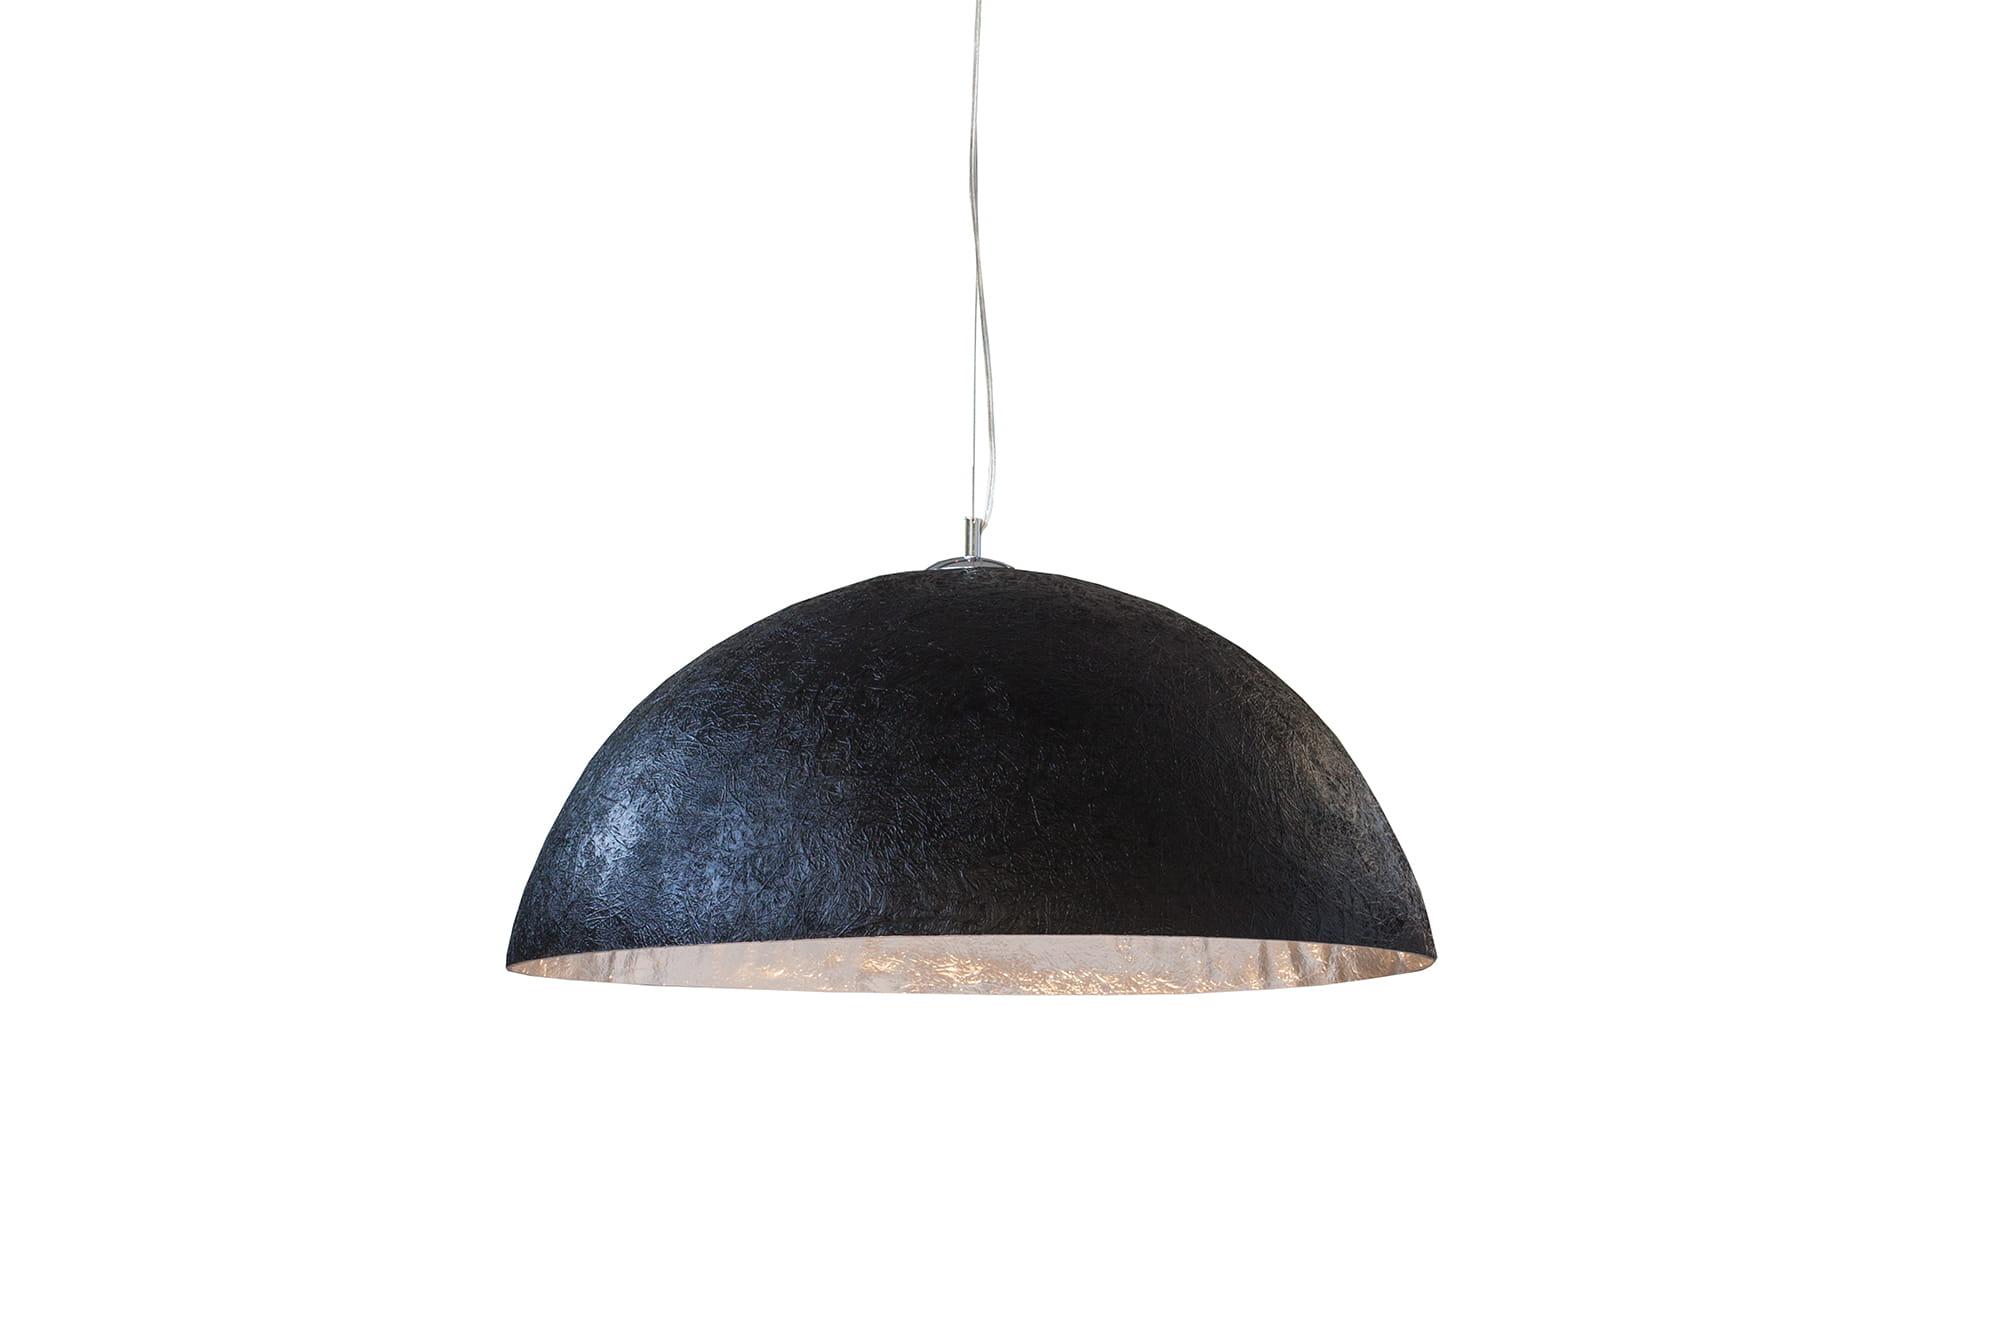 Lampa wiszÄ…ca Sinus czarno-srebrna 50 cm